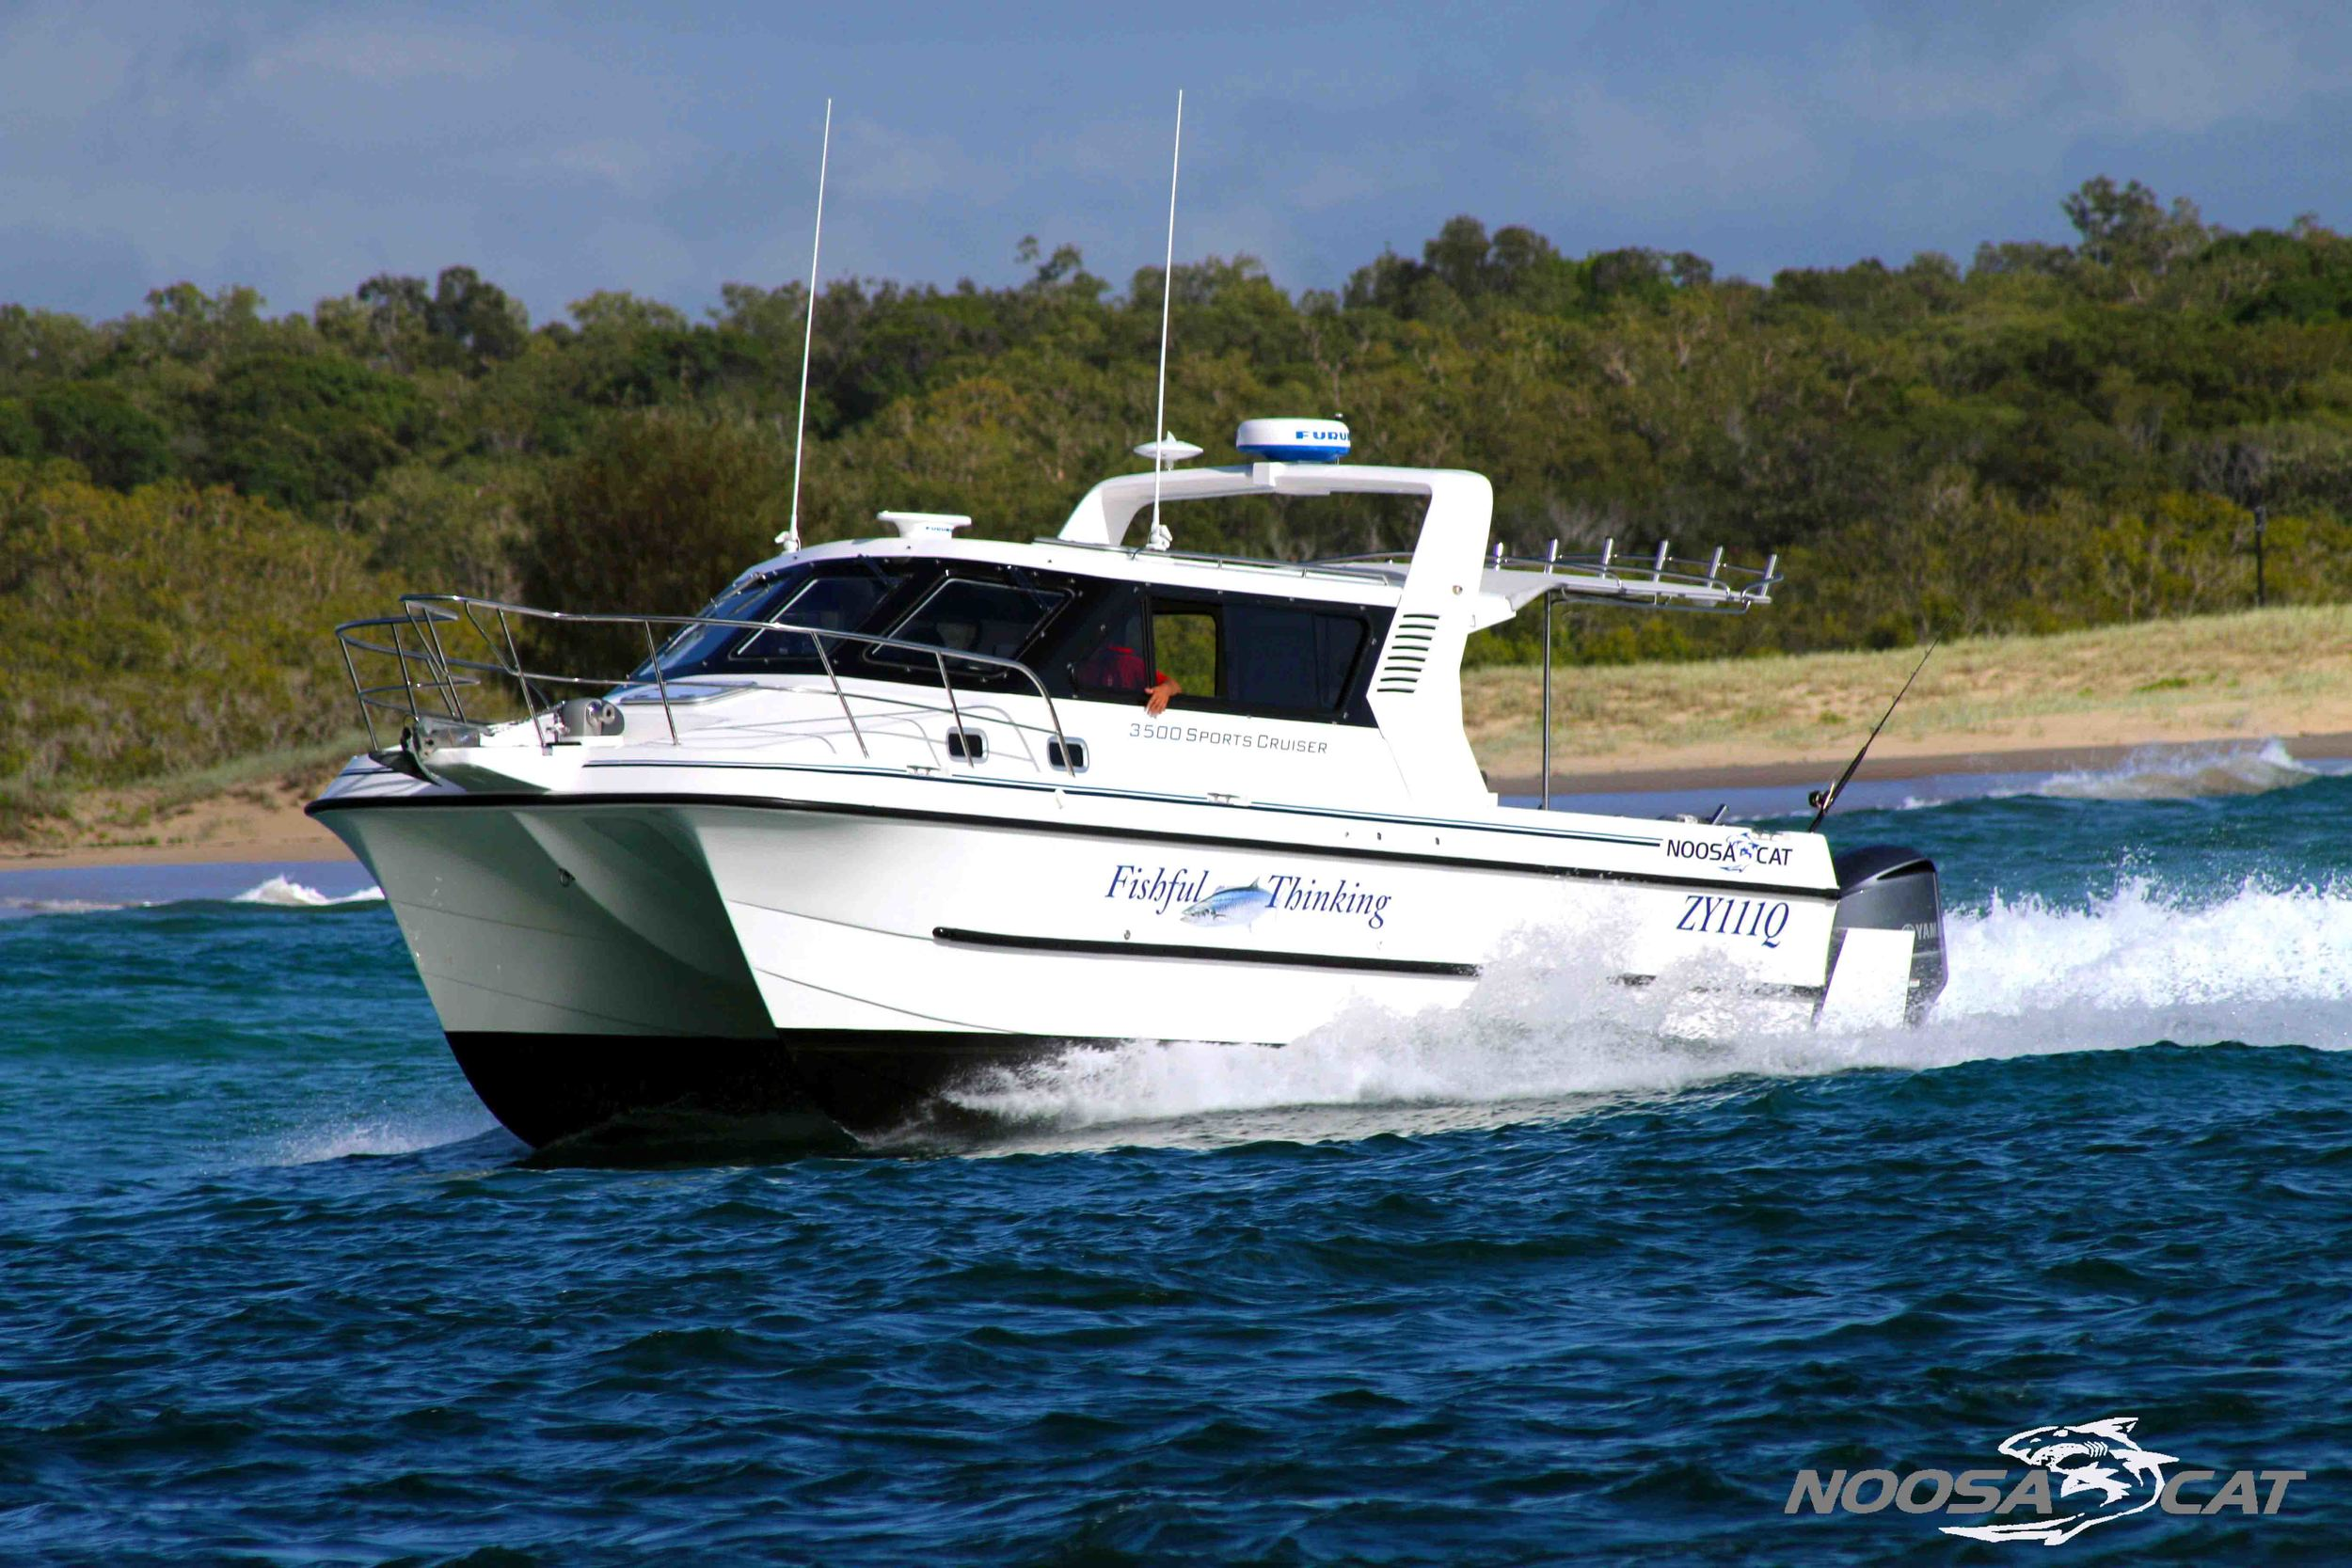 Noosa Cat 3500 Sportscruiser 'Fishful Thinking'.jpg